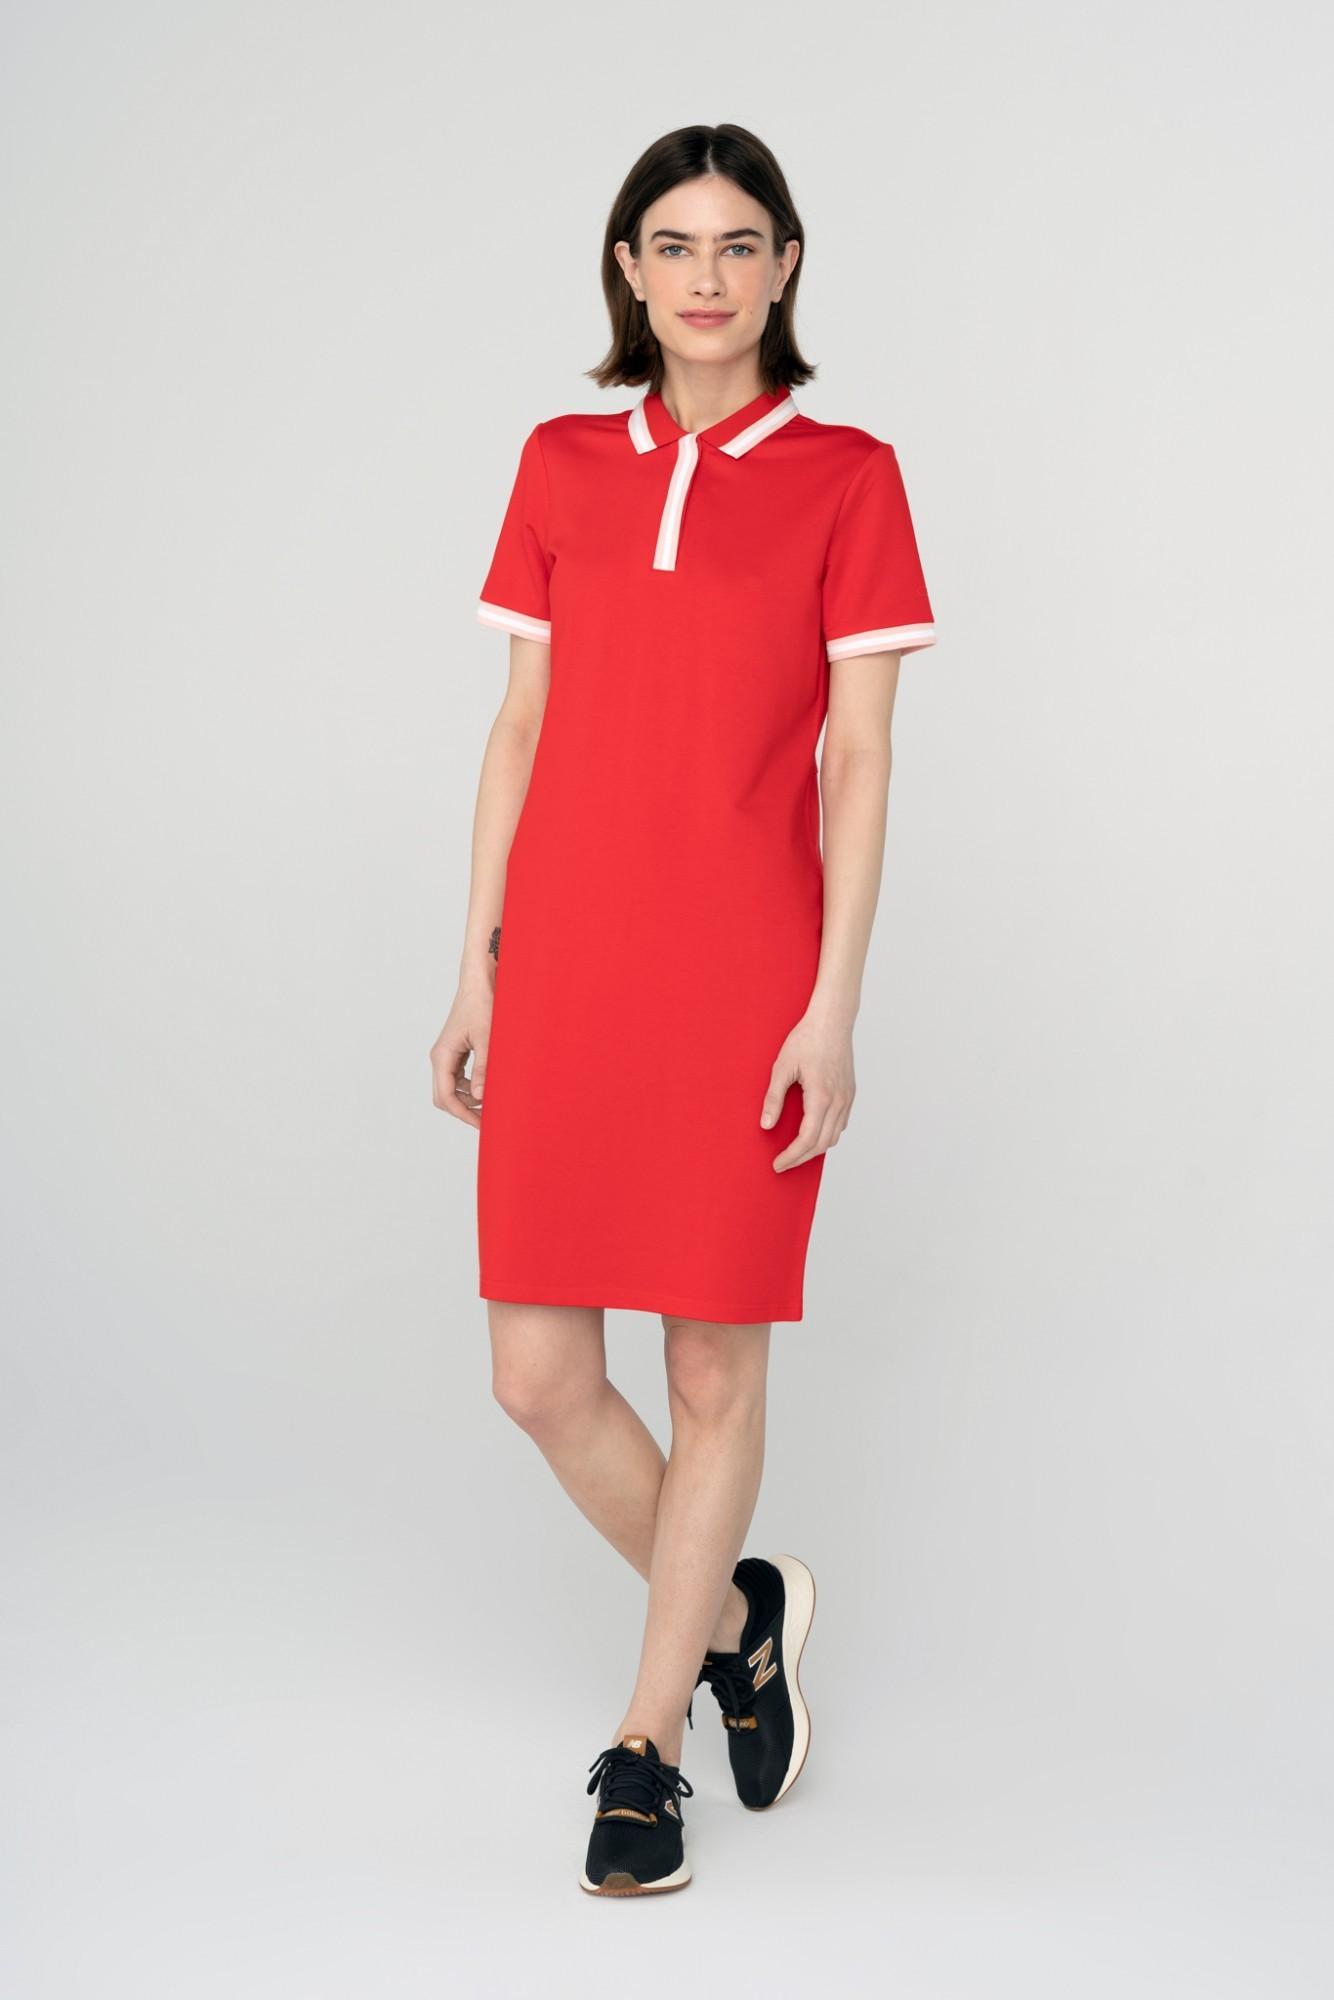 AUDIMAS Švelni modalo polo suknelė 2111-172 High Risk Red L